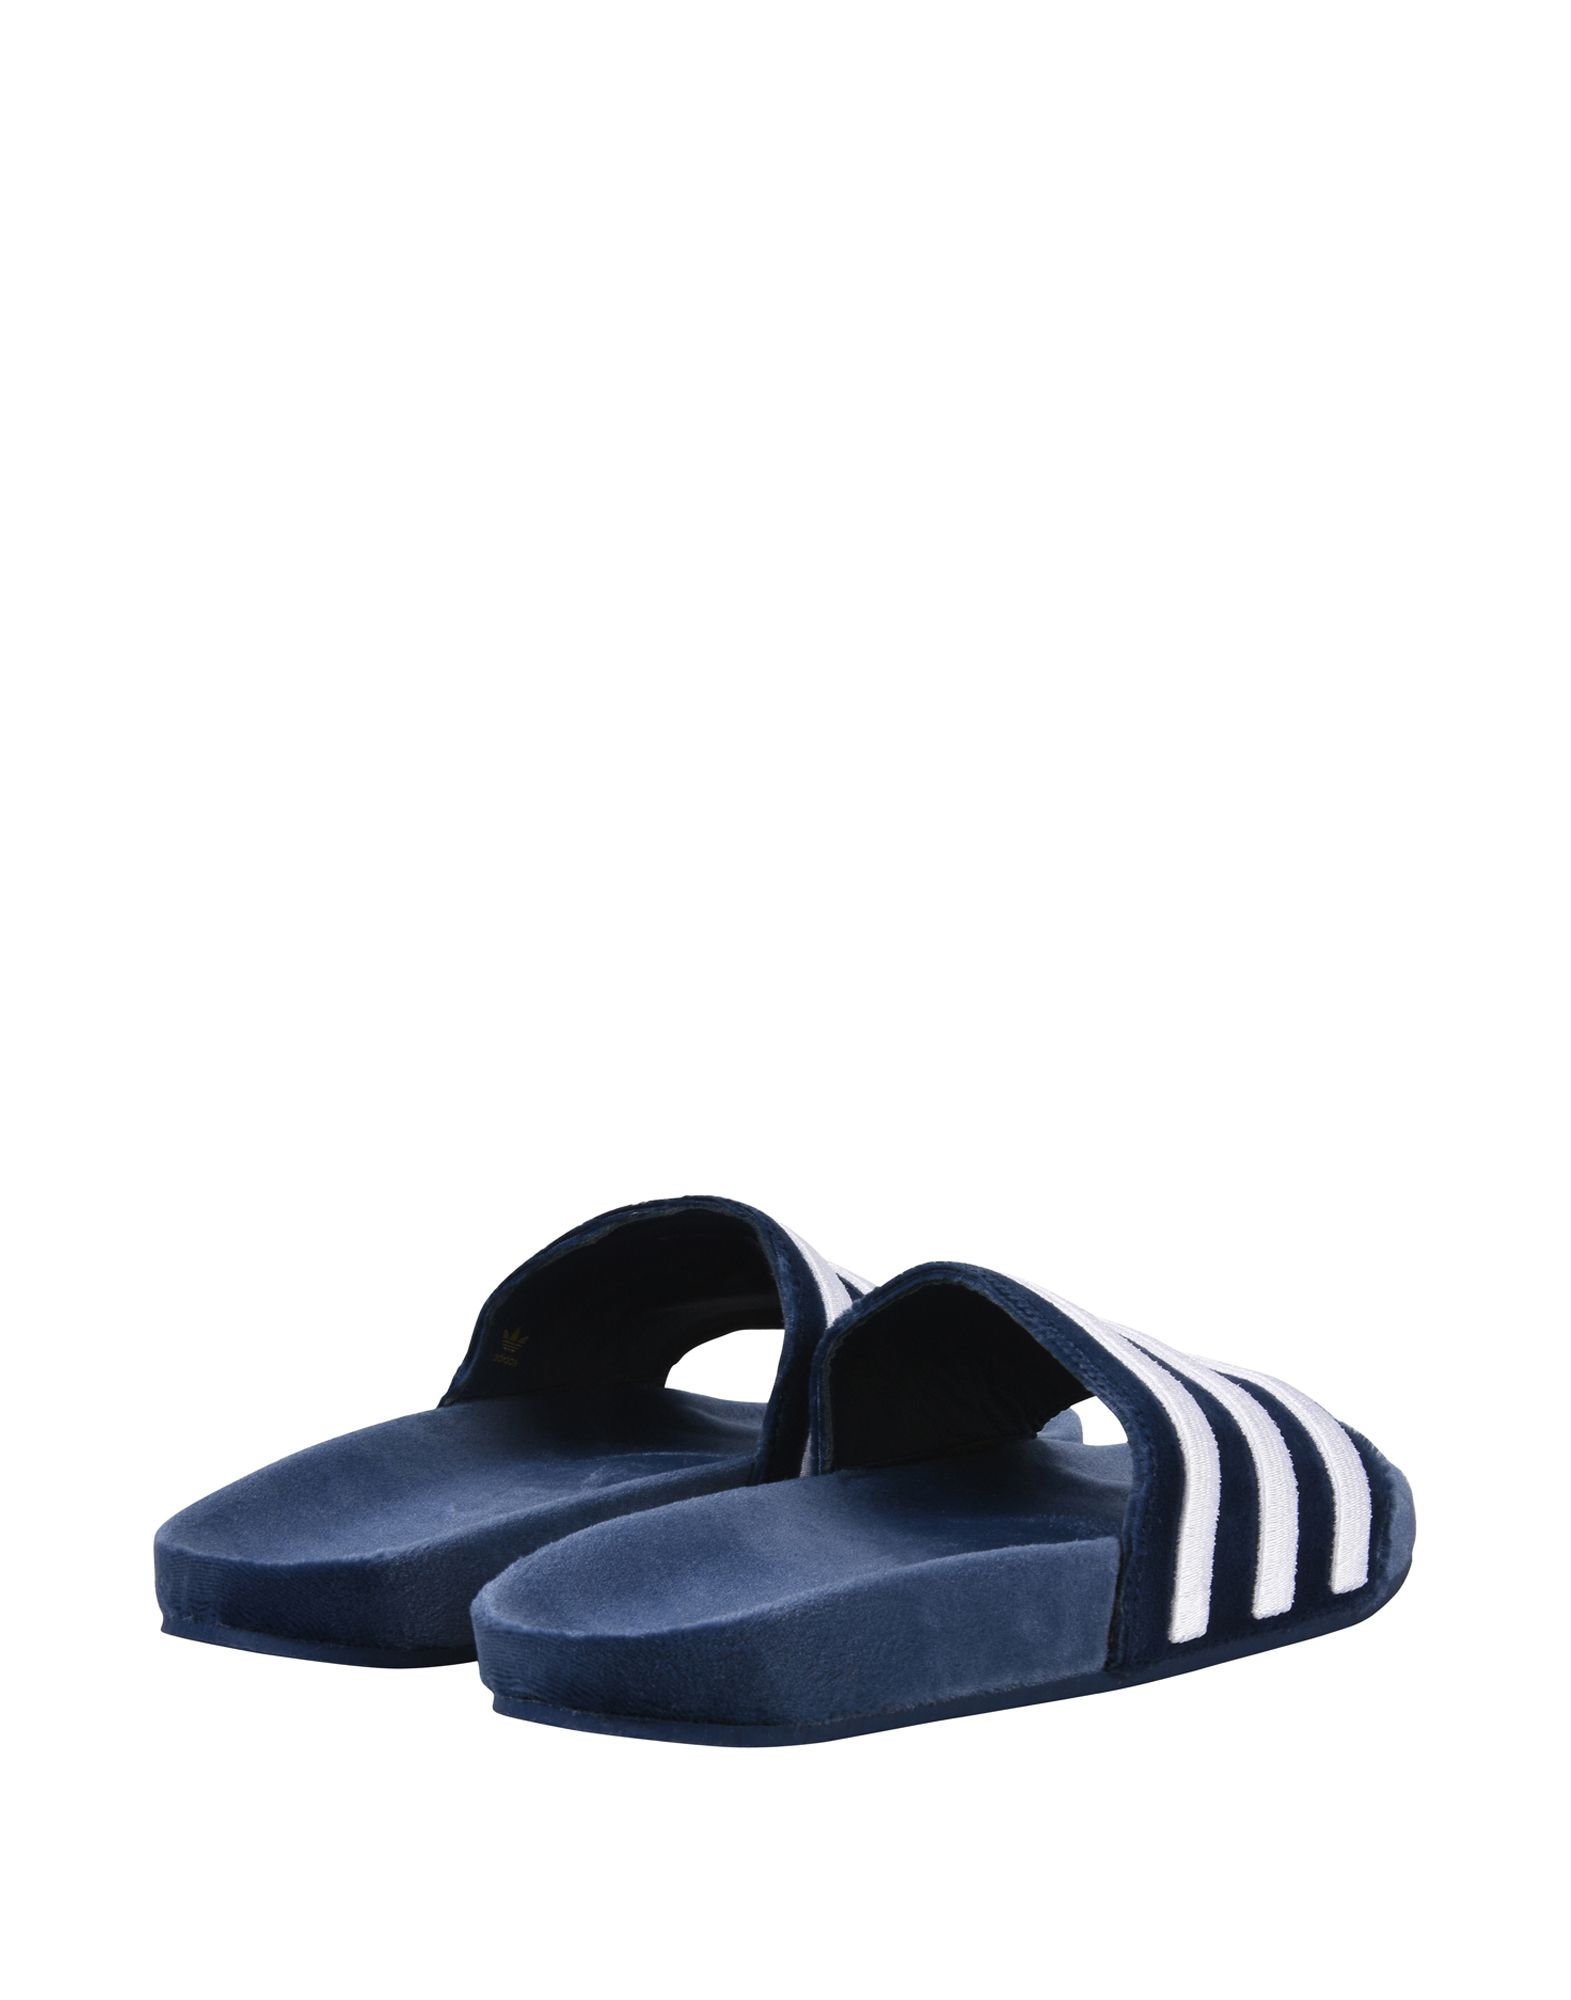 Adidas  Originals Adilette  11307125VT  Adidas 9a19ee